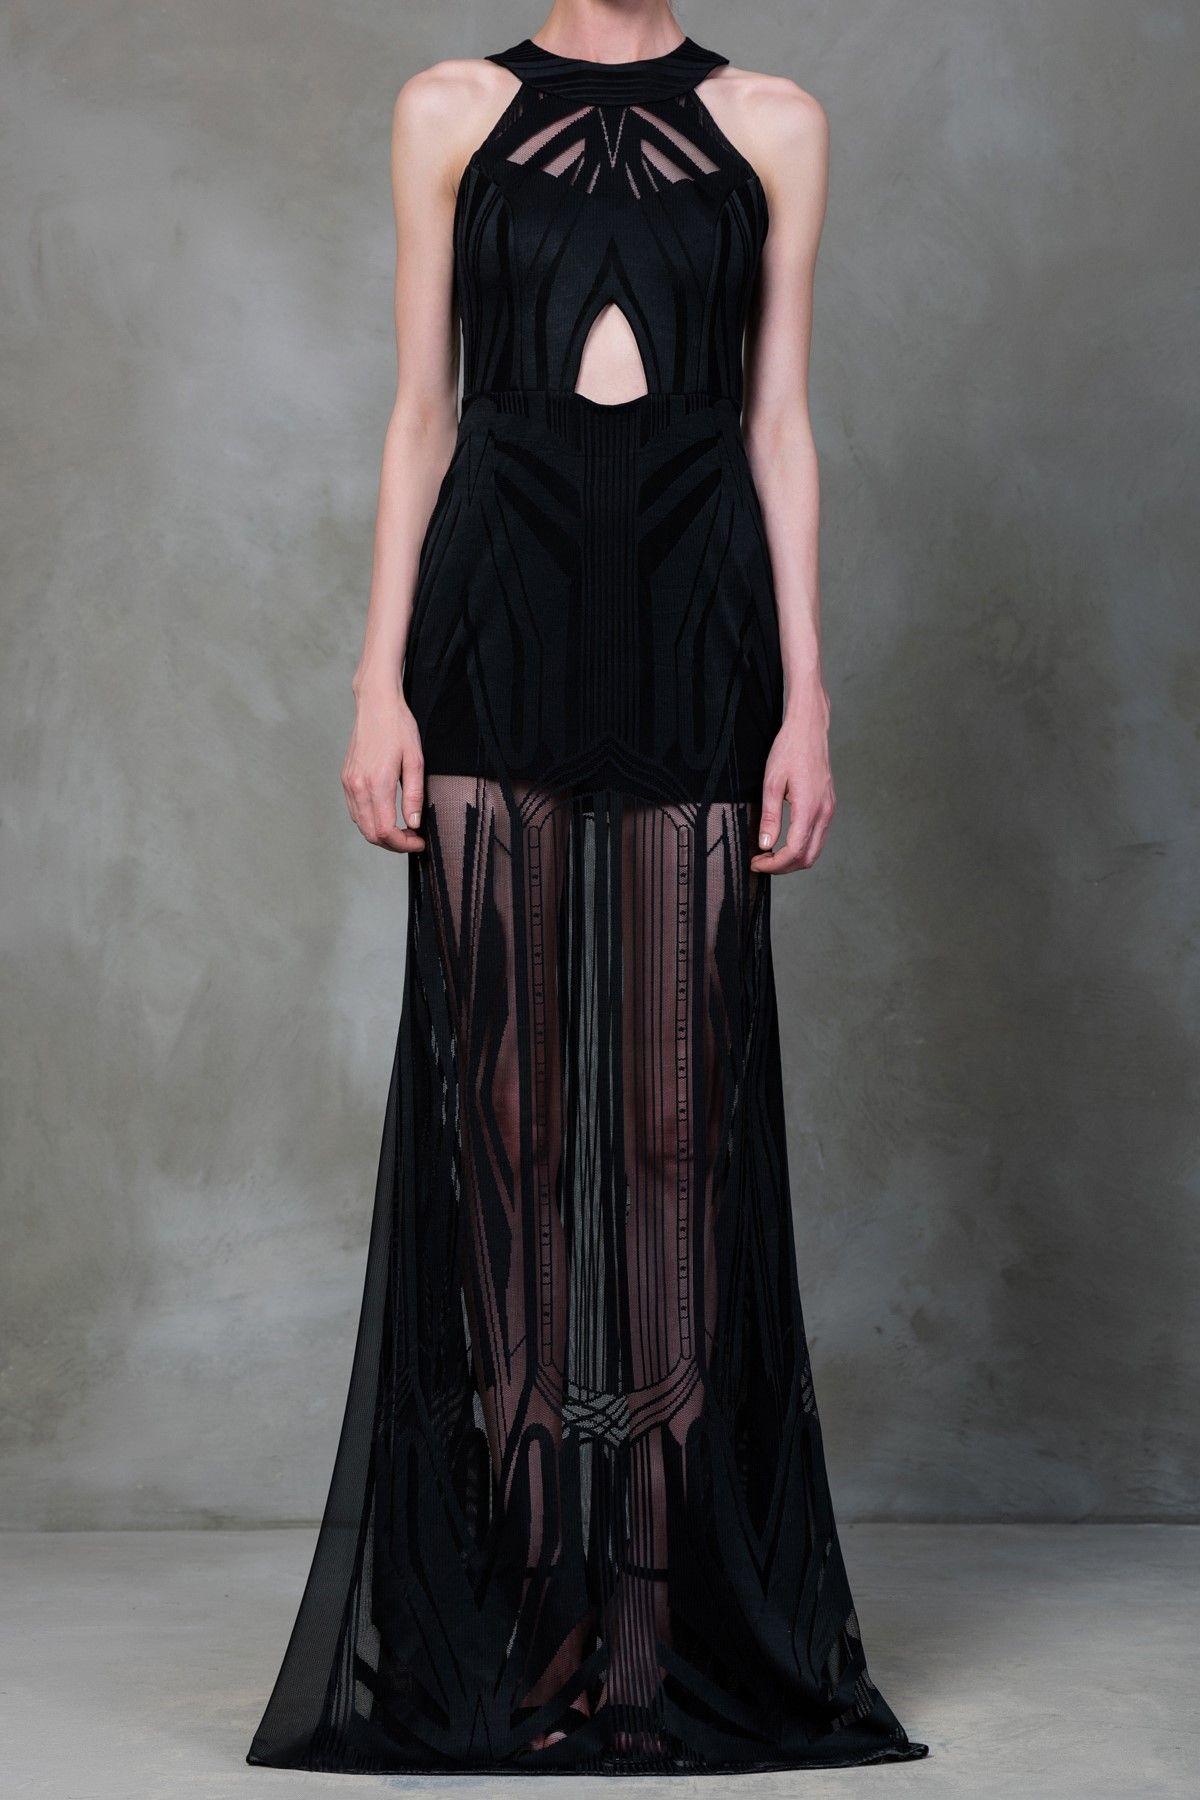 Mara Siyah Elbise Mlwss16de3041 Raisa Vanessa For Trendyol Trendyol Moda Stilleri Elbise The Dress